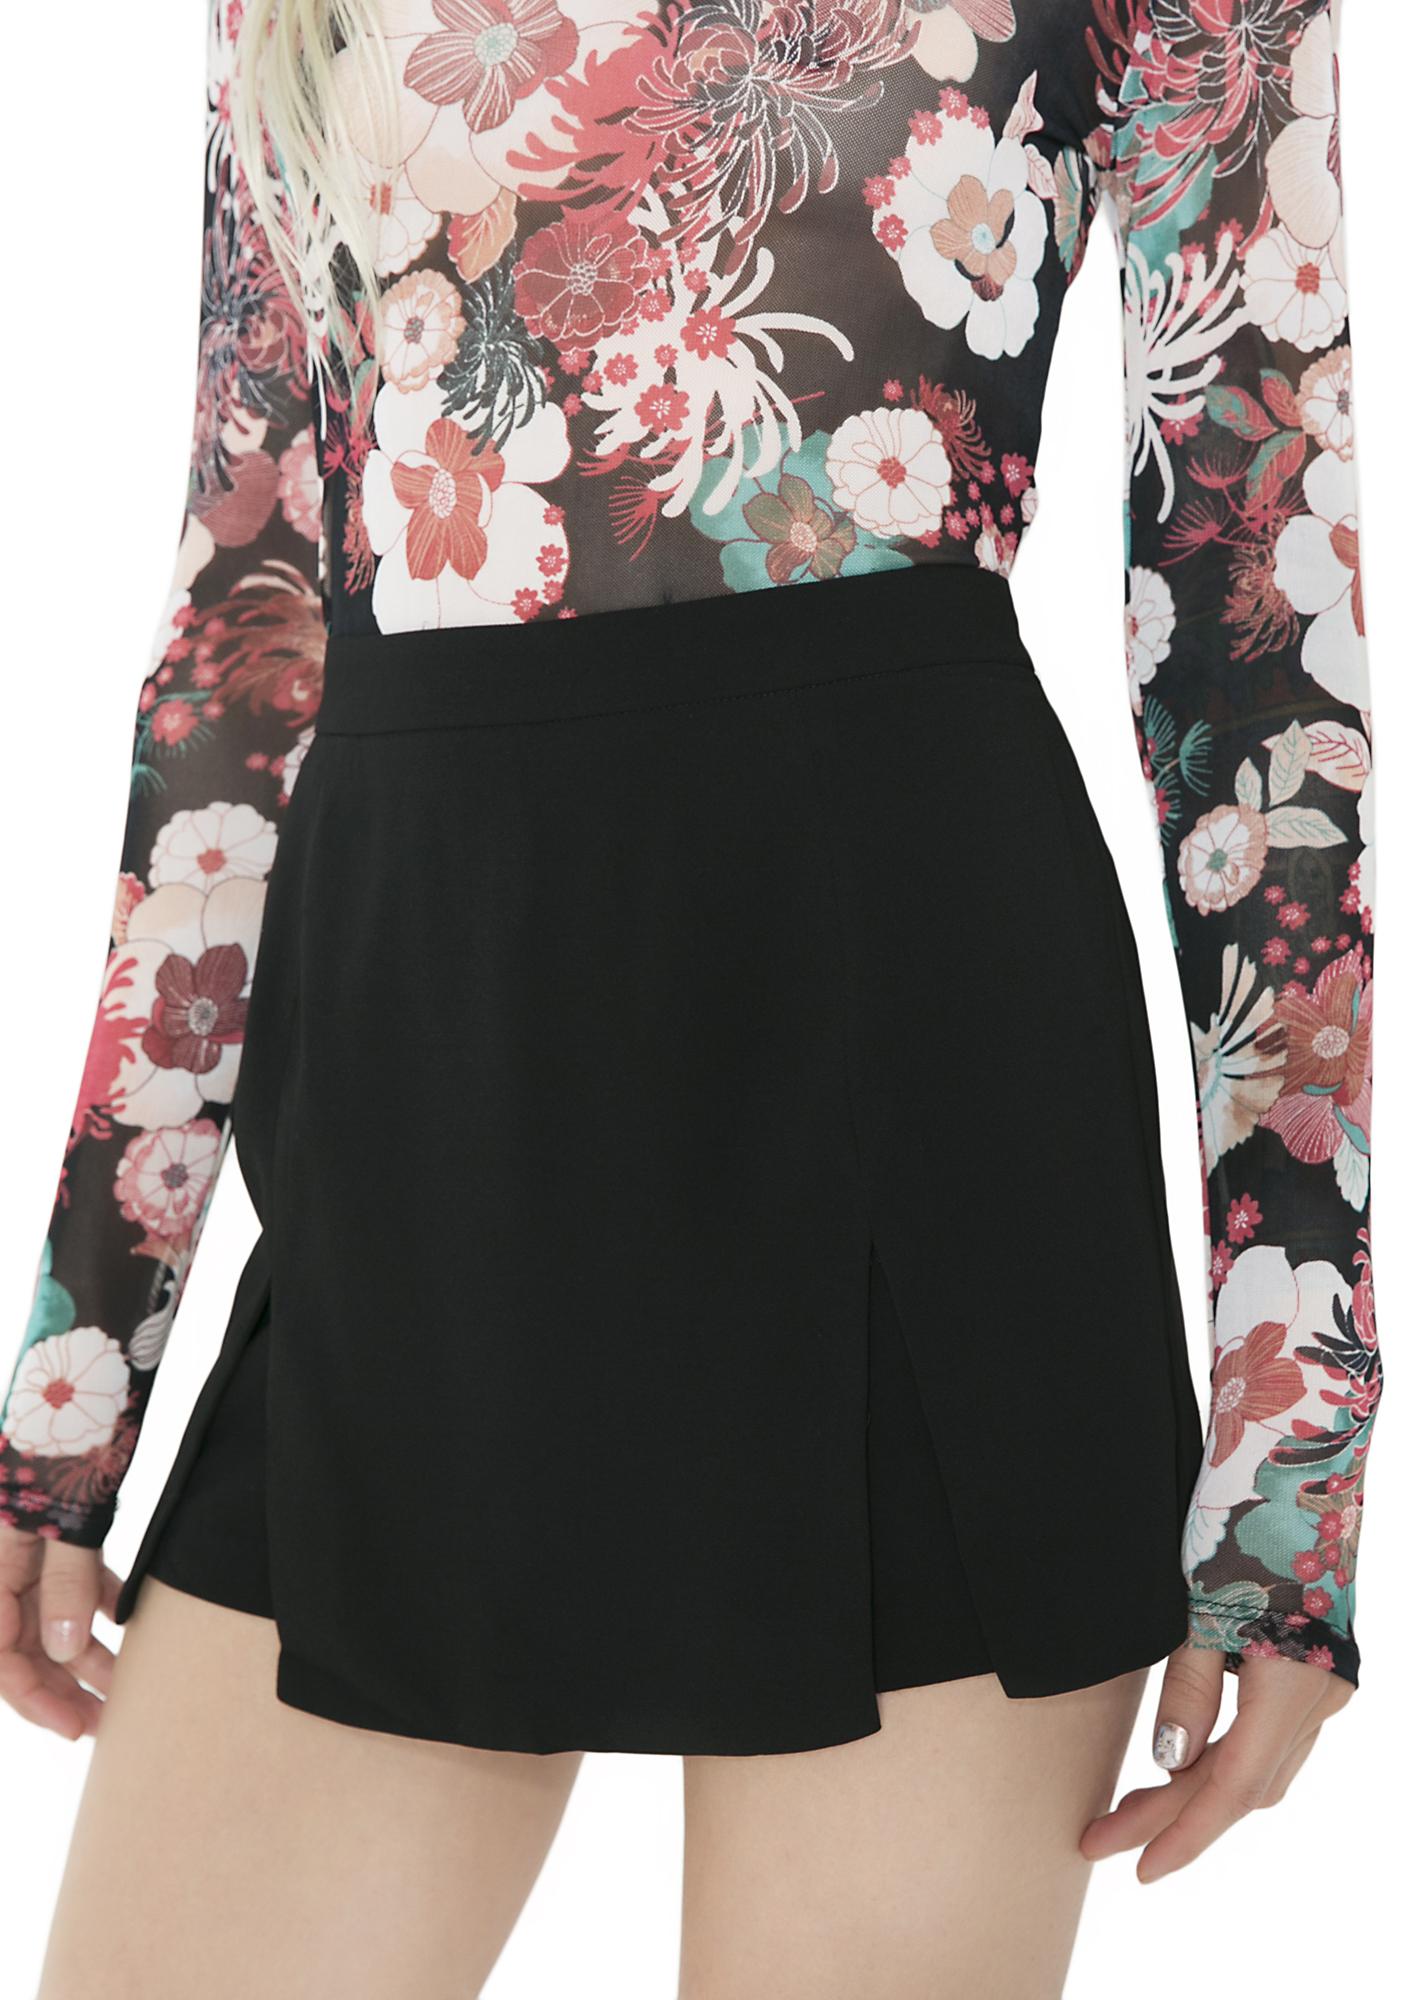 Pleated High Waist Skort Shorts Black